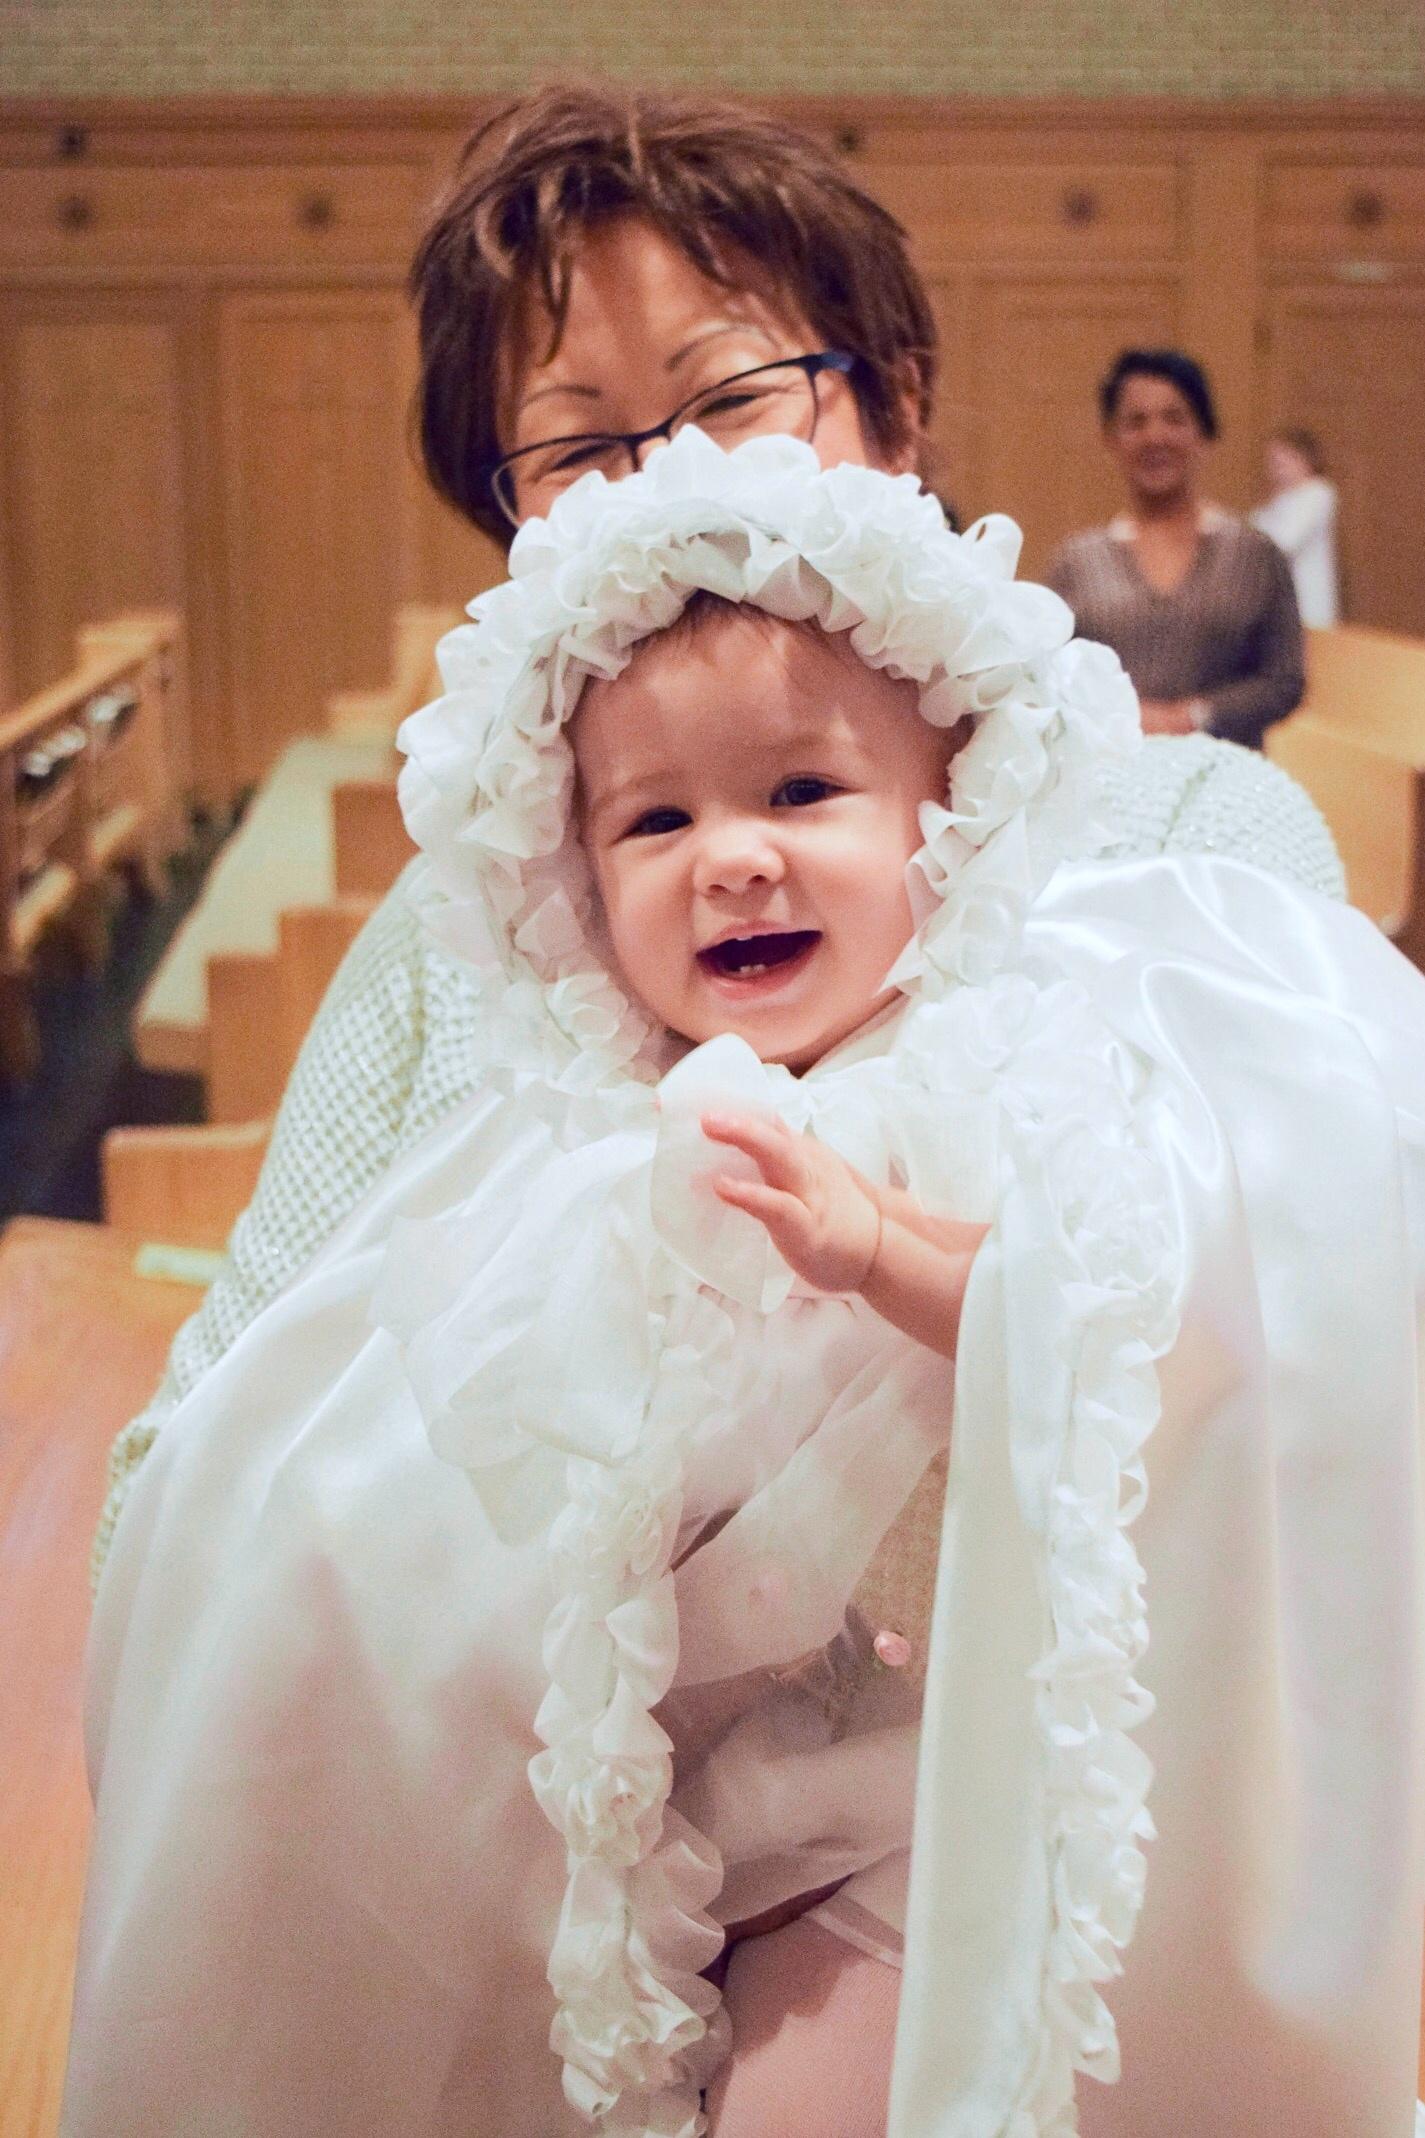 BIRTHDAY + BAPTISM